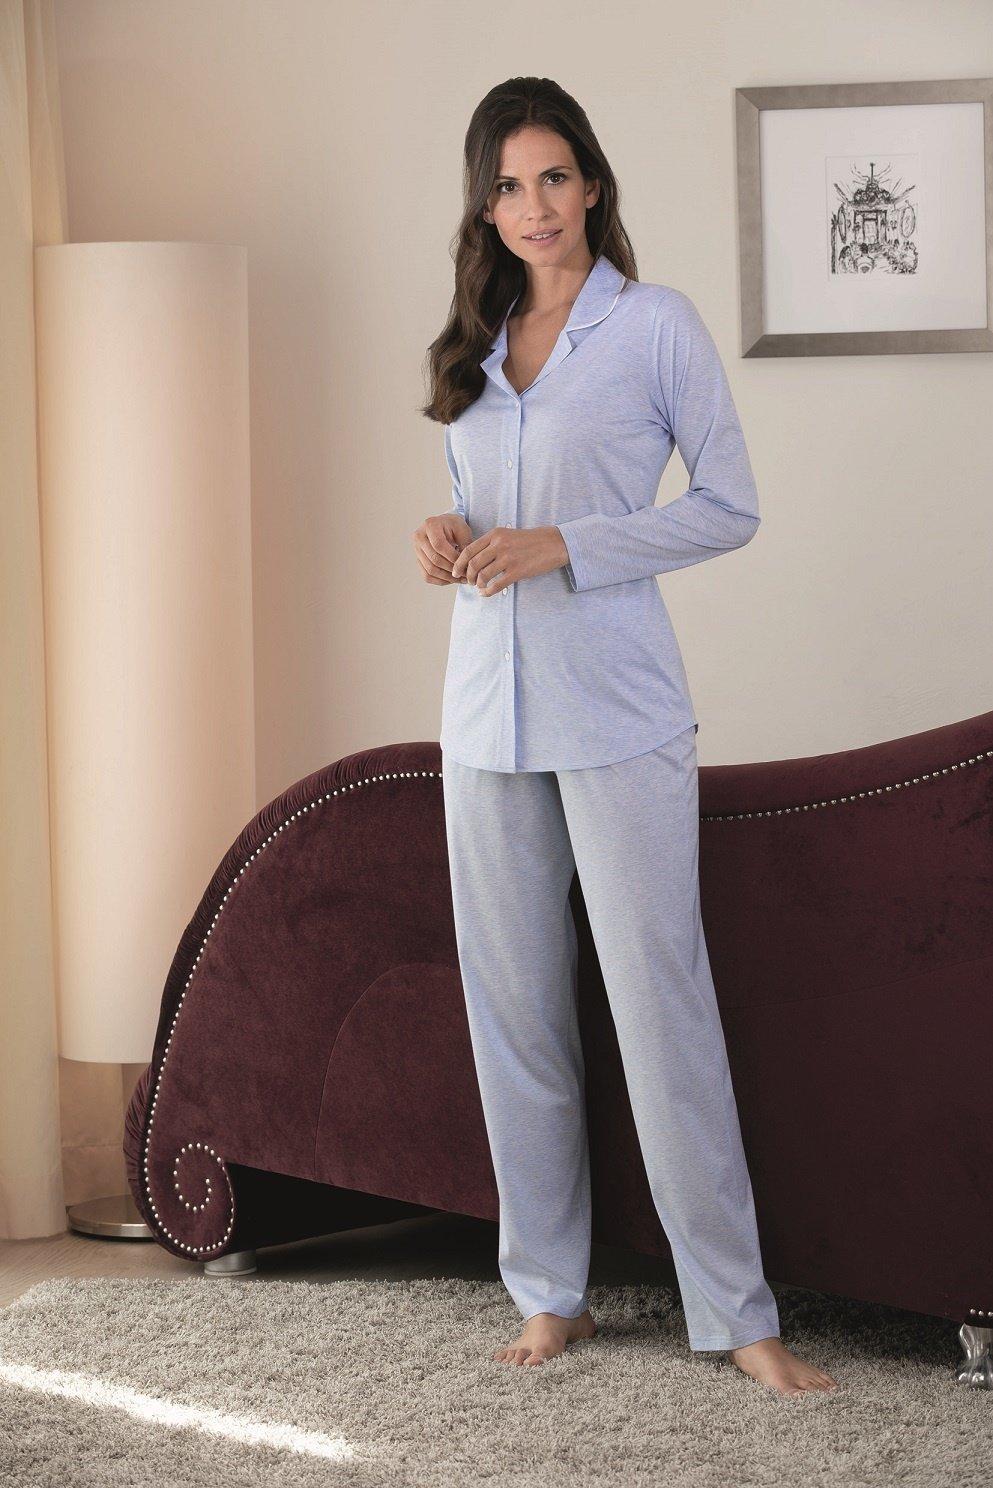 finest selection 582ae 779c0 Novila|Damen Pyjama|Schlafanzug Jersey|Textile Träume|Neue Kollektion